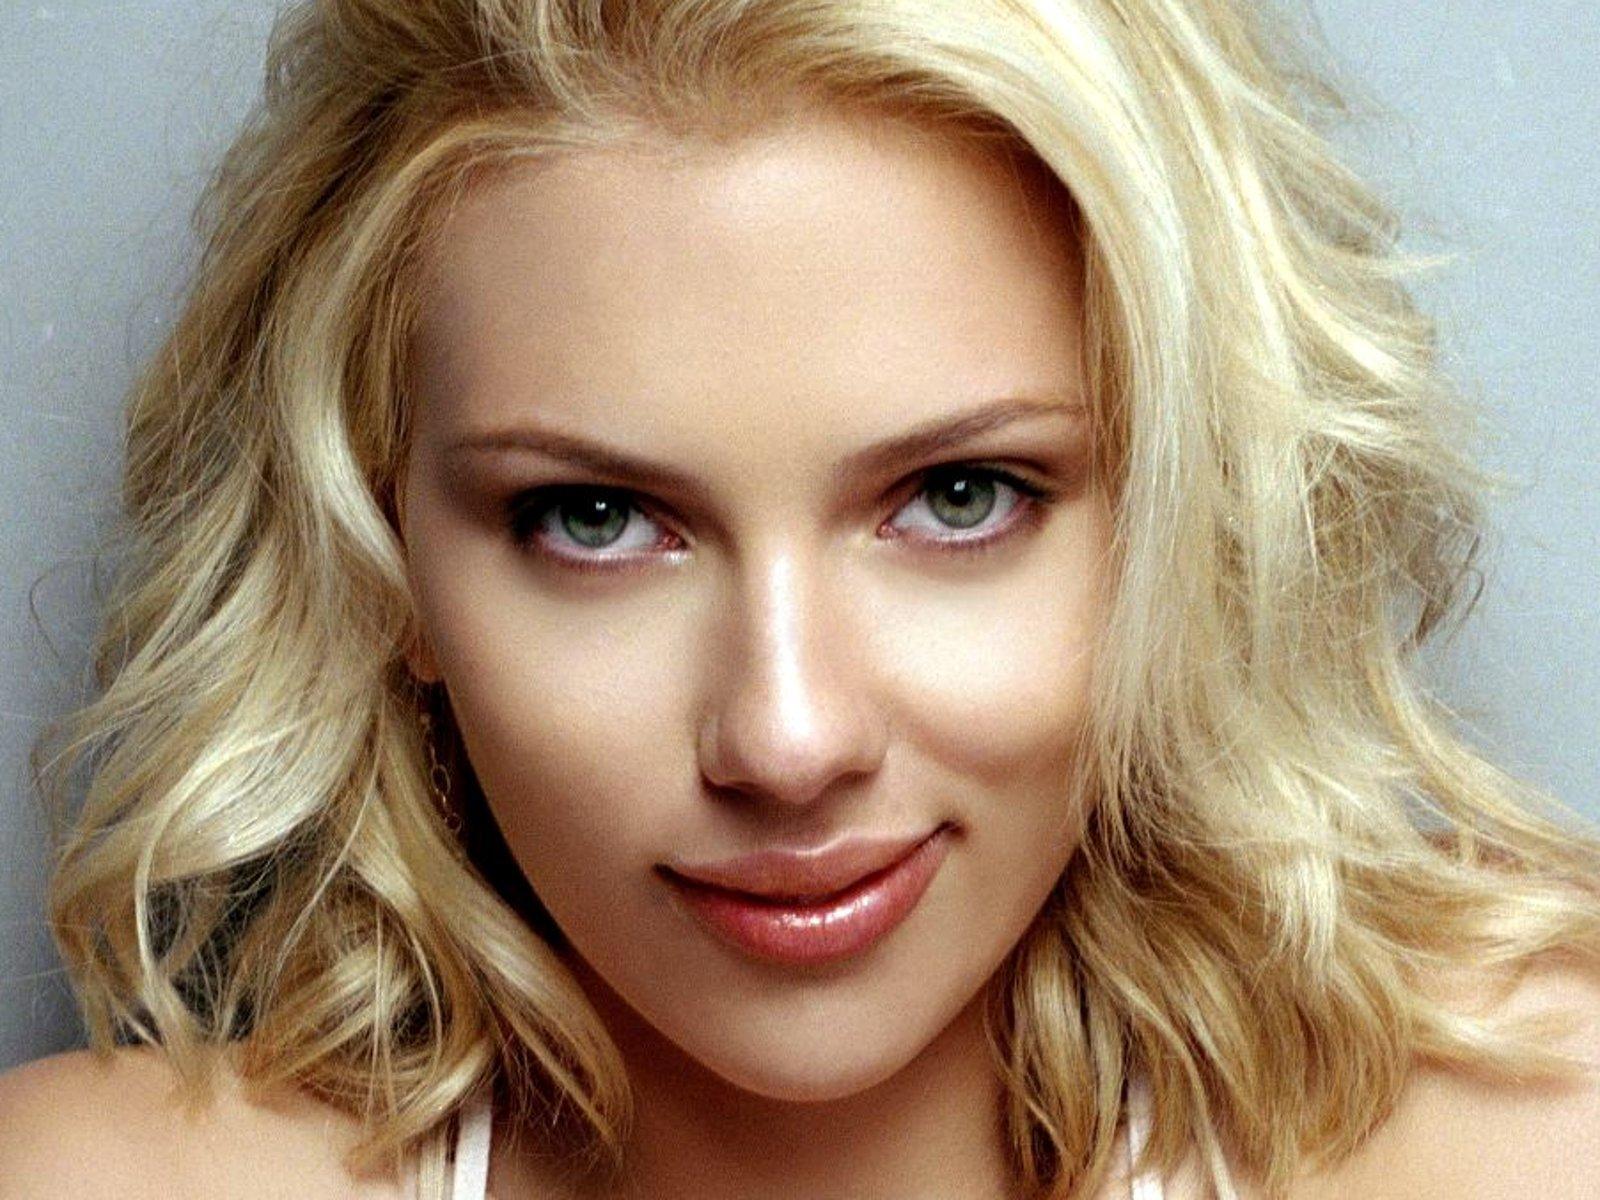 http://3.bp.blogspot.com/-lrZGhk2cuWU/TqwPpi3Bh1I/AAAAAAAAIak/VcXGQbhMwTY/s1600/Scarlett+Johansson+3.jpg